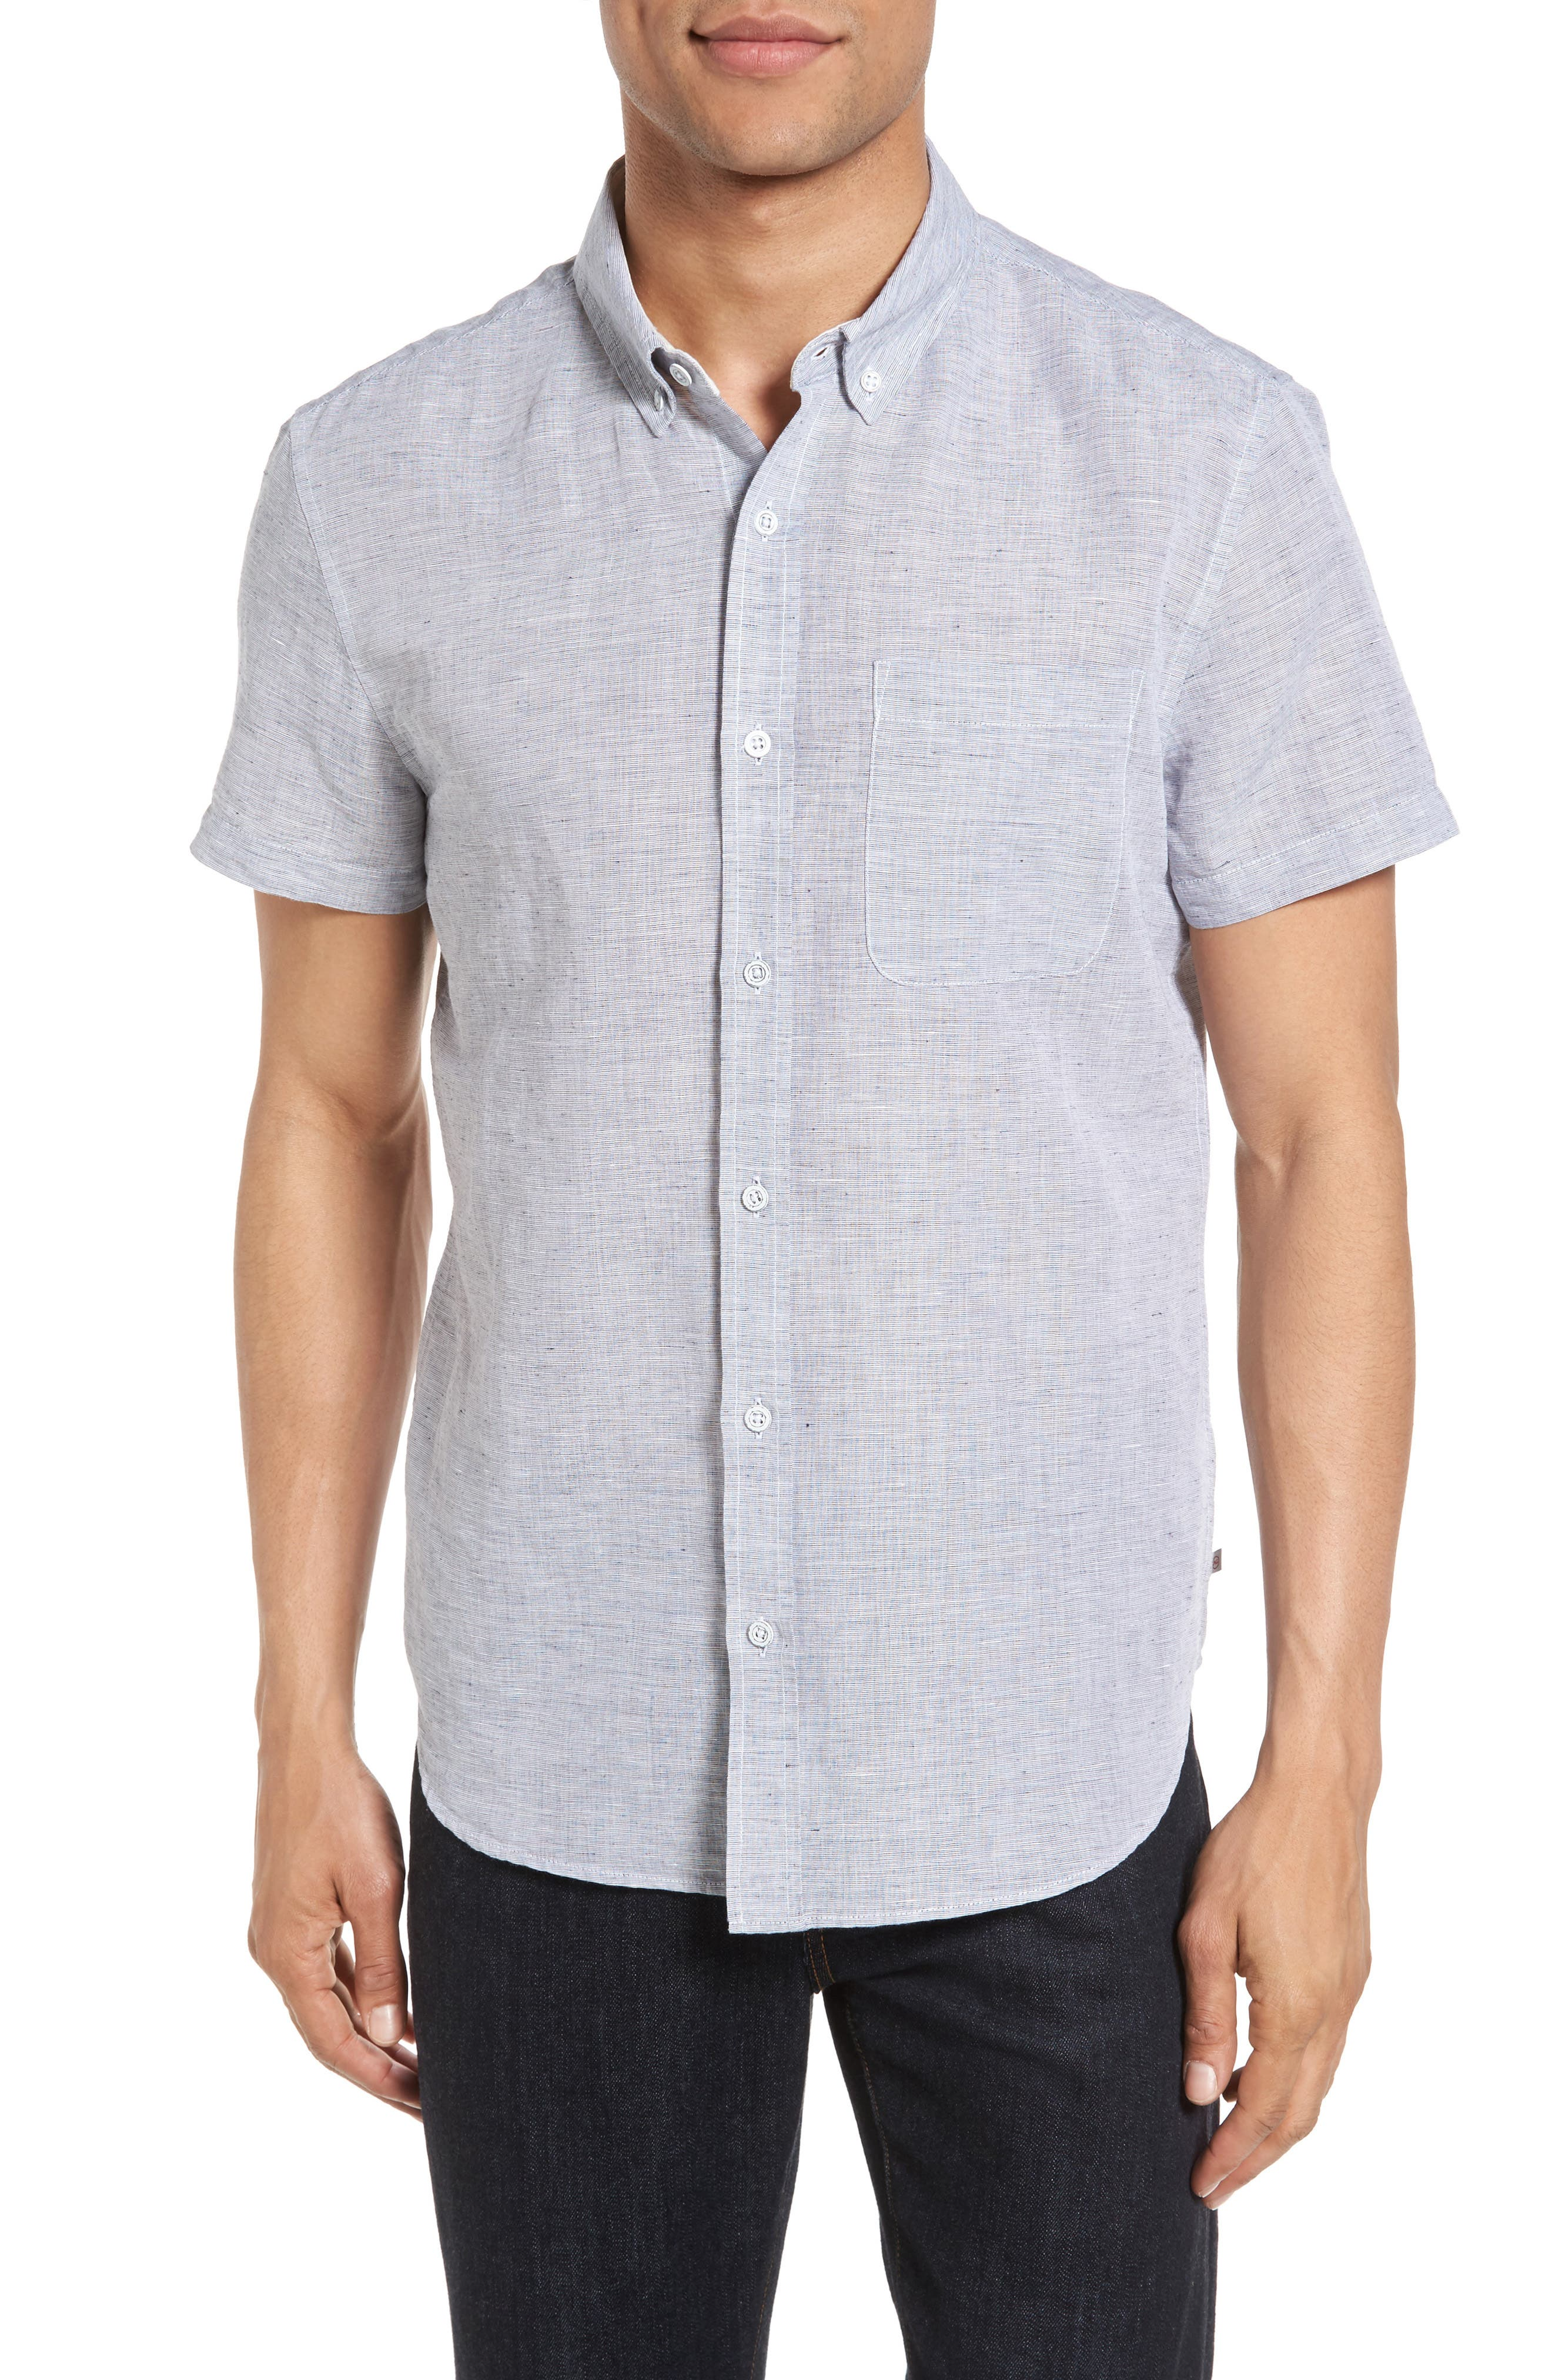 Alternate Image 1 Selected - AG Nash Slim Fit Linen & Cotton Sport Shirt